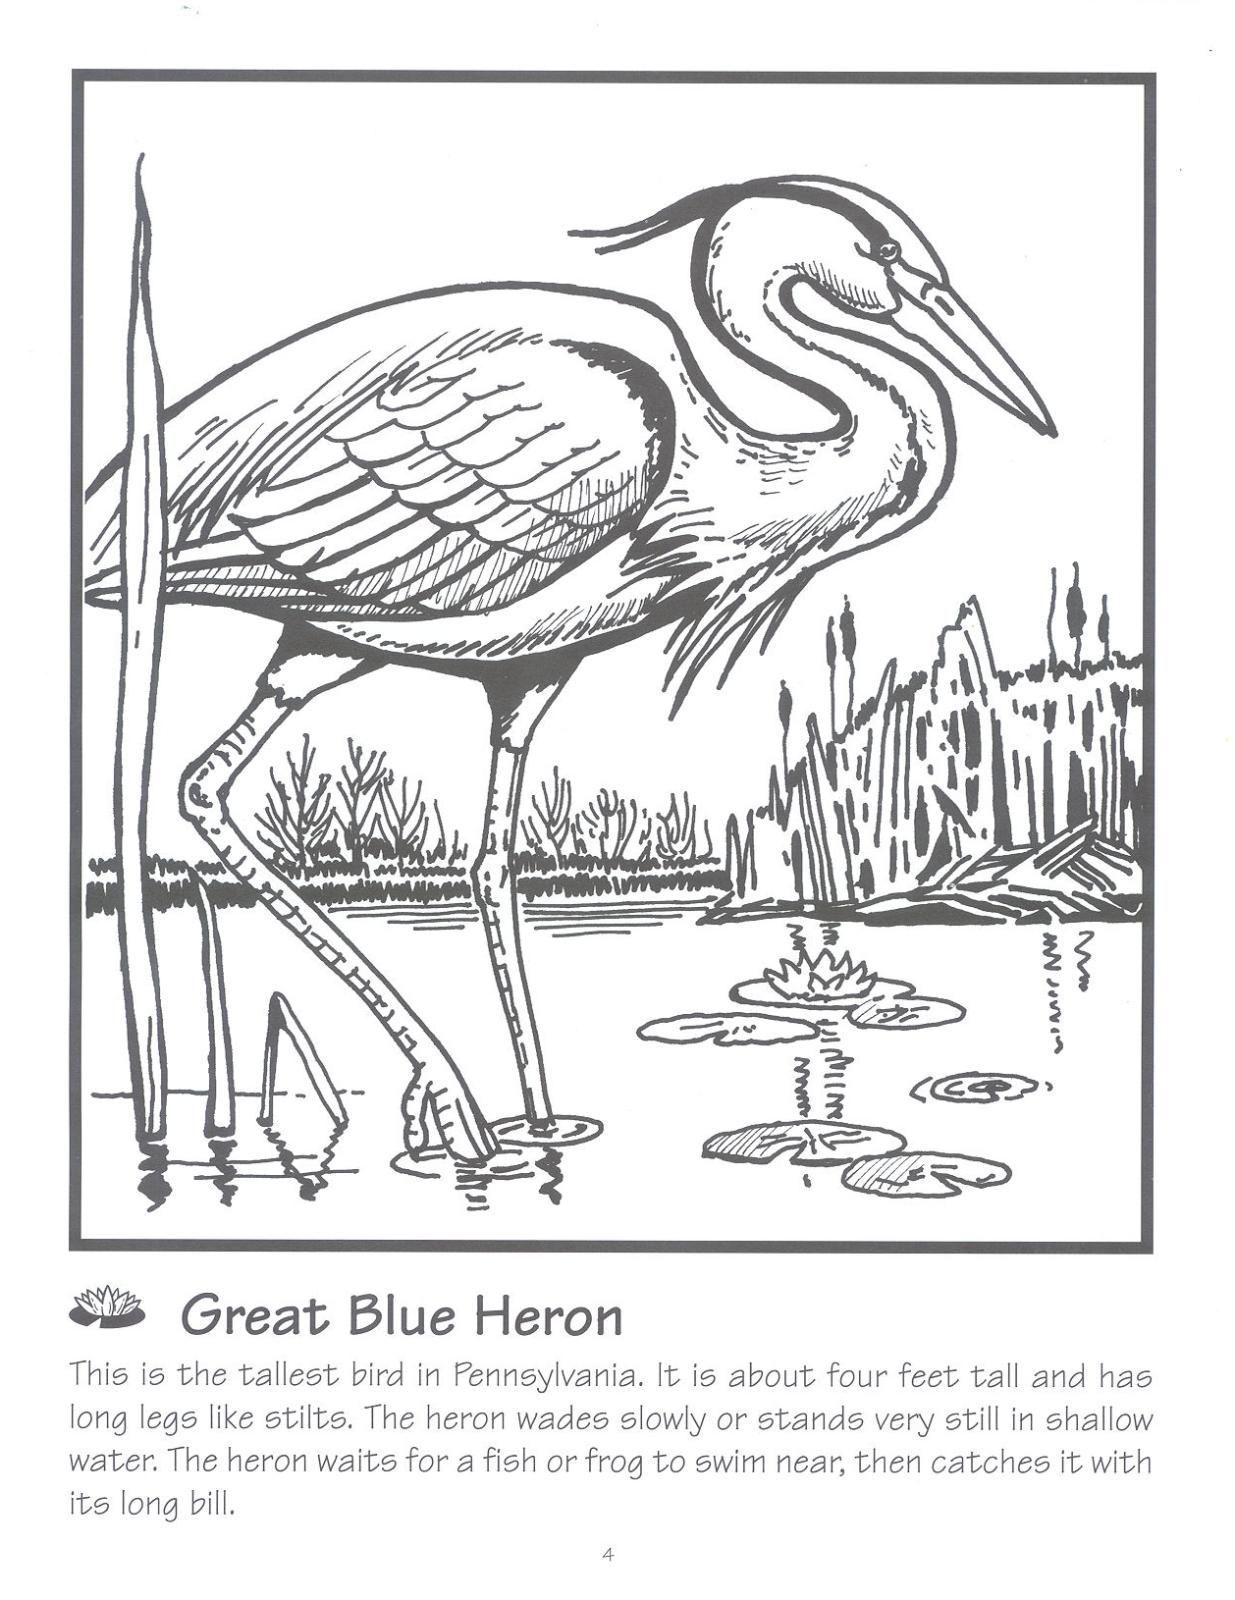 Great Blue Heron Jpg 1 235 1 600 Pixels Bird Coloring Pages Coloring Pages Blue Heron